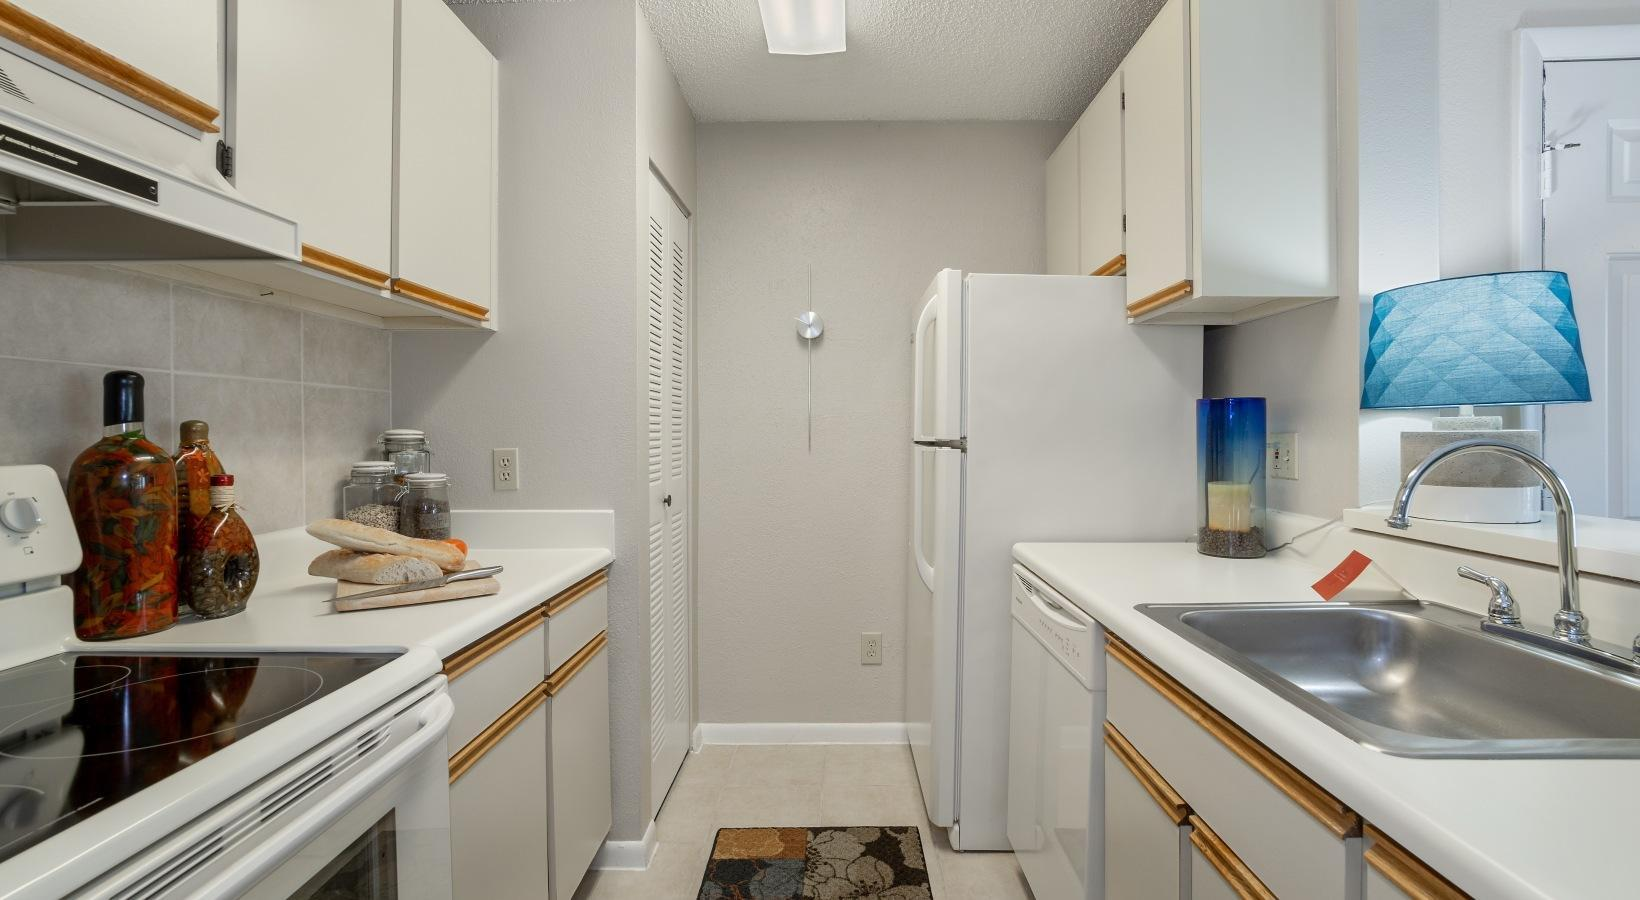 520 Terraceview Cove #4-101, Altamonte Springs, FL - 1,392 USD/ month